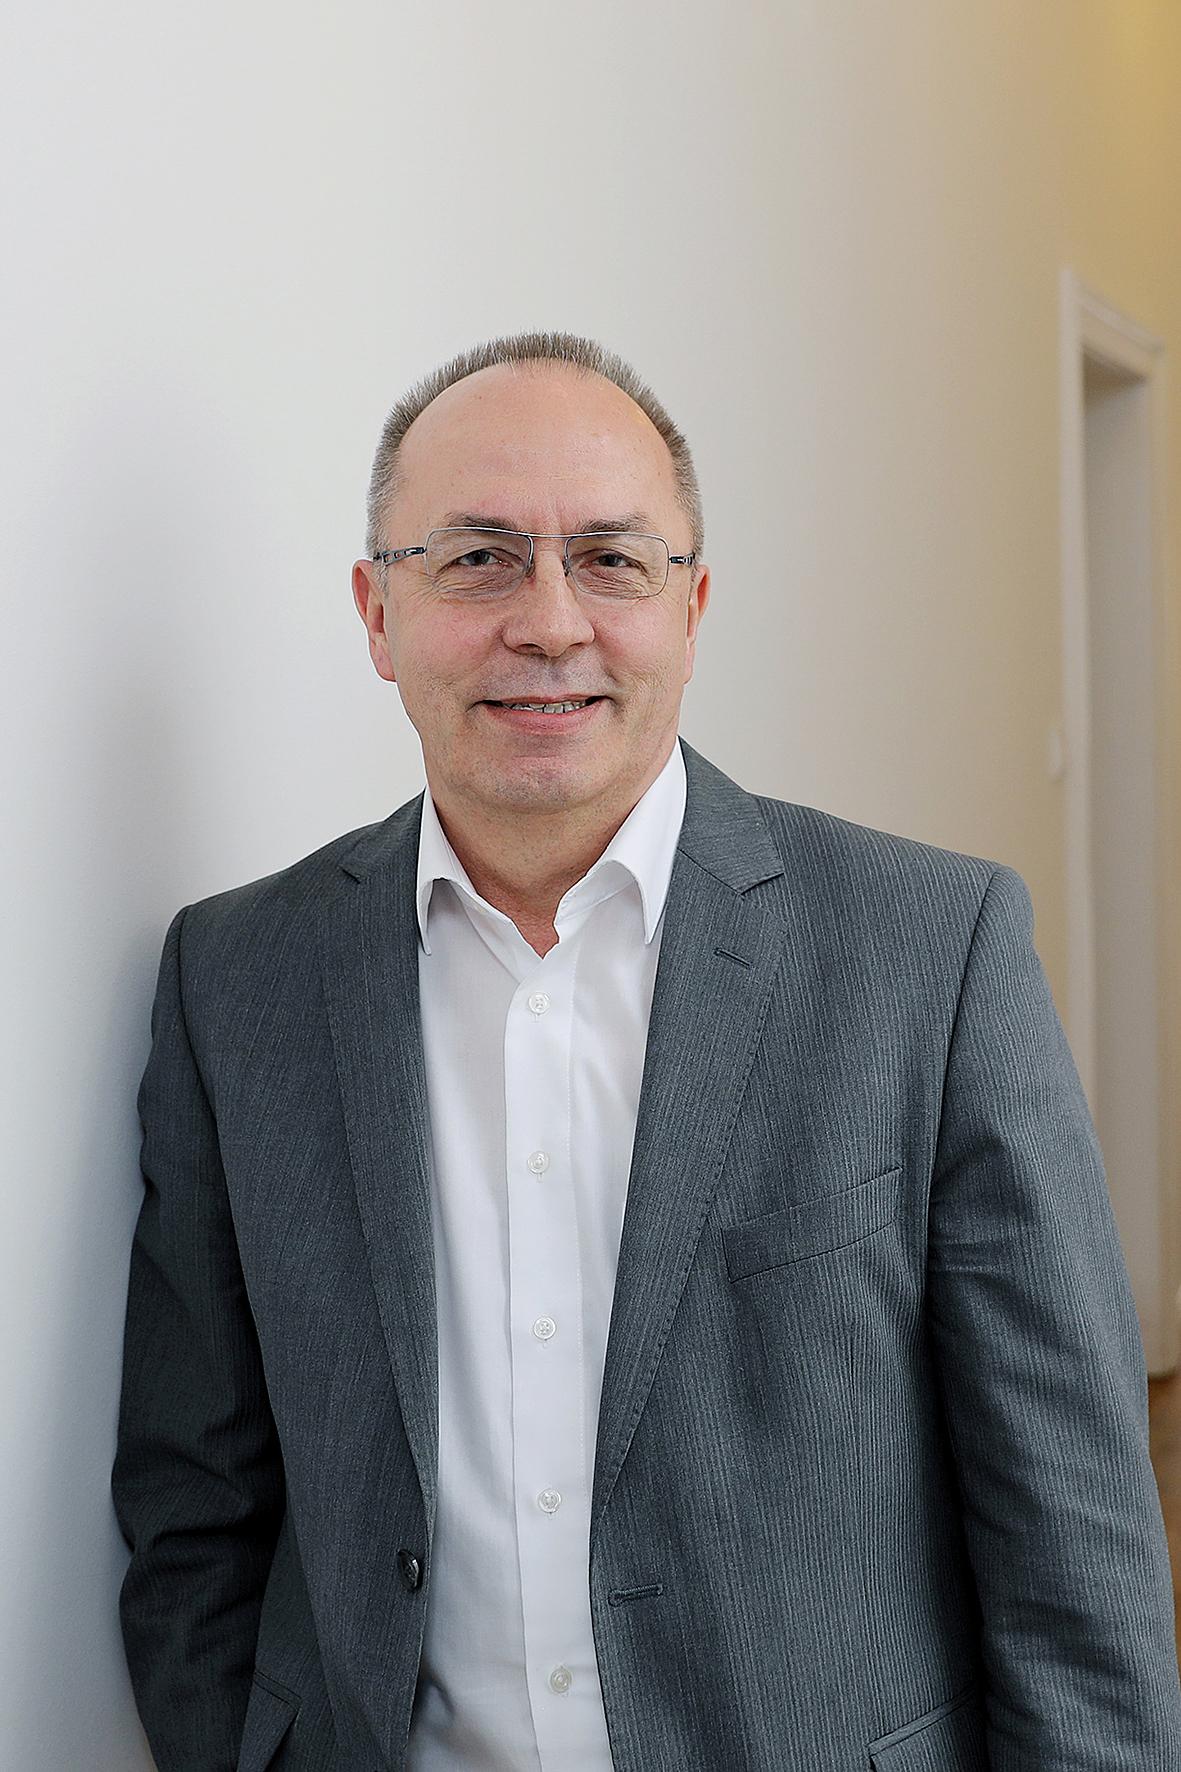 Klaus Kohlenberg